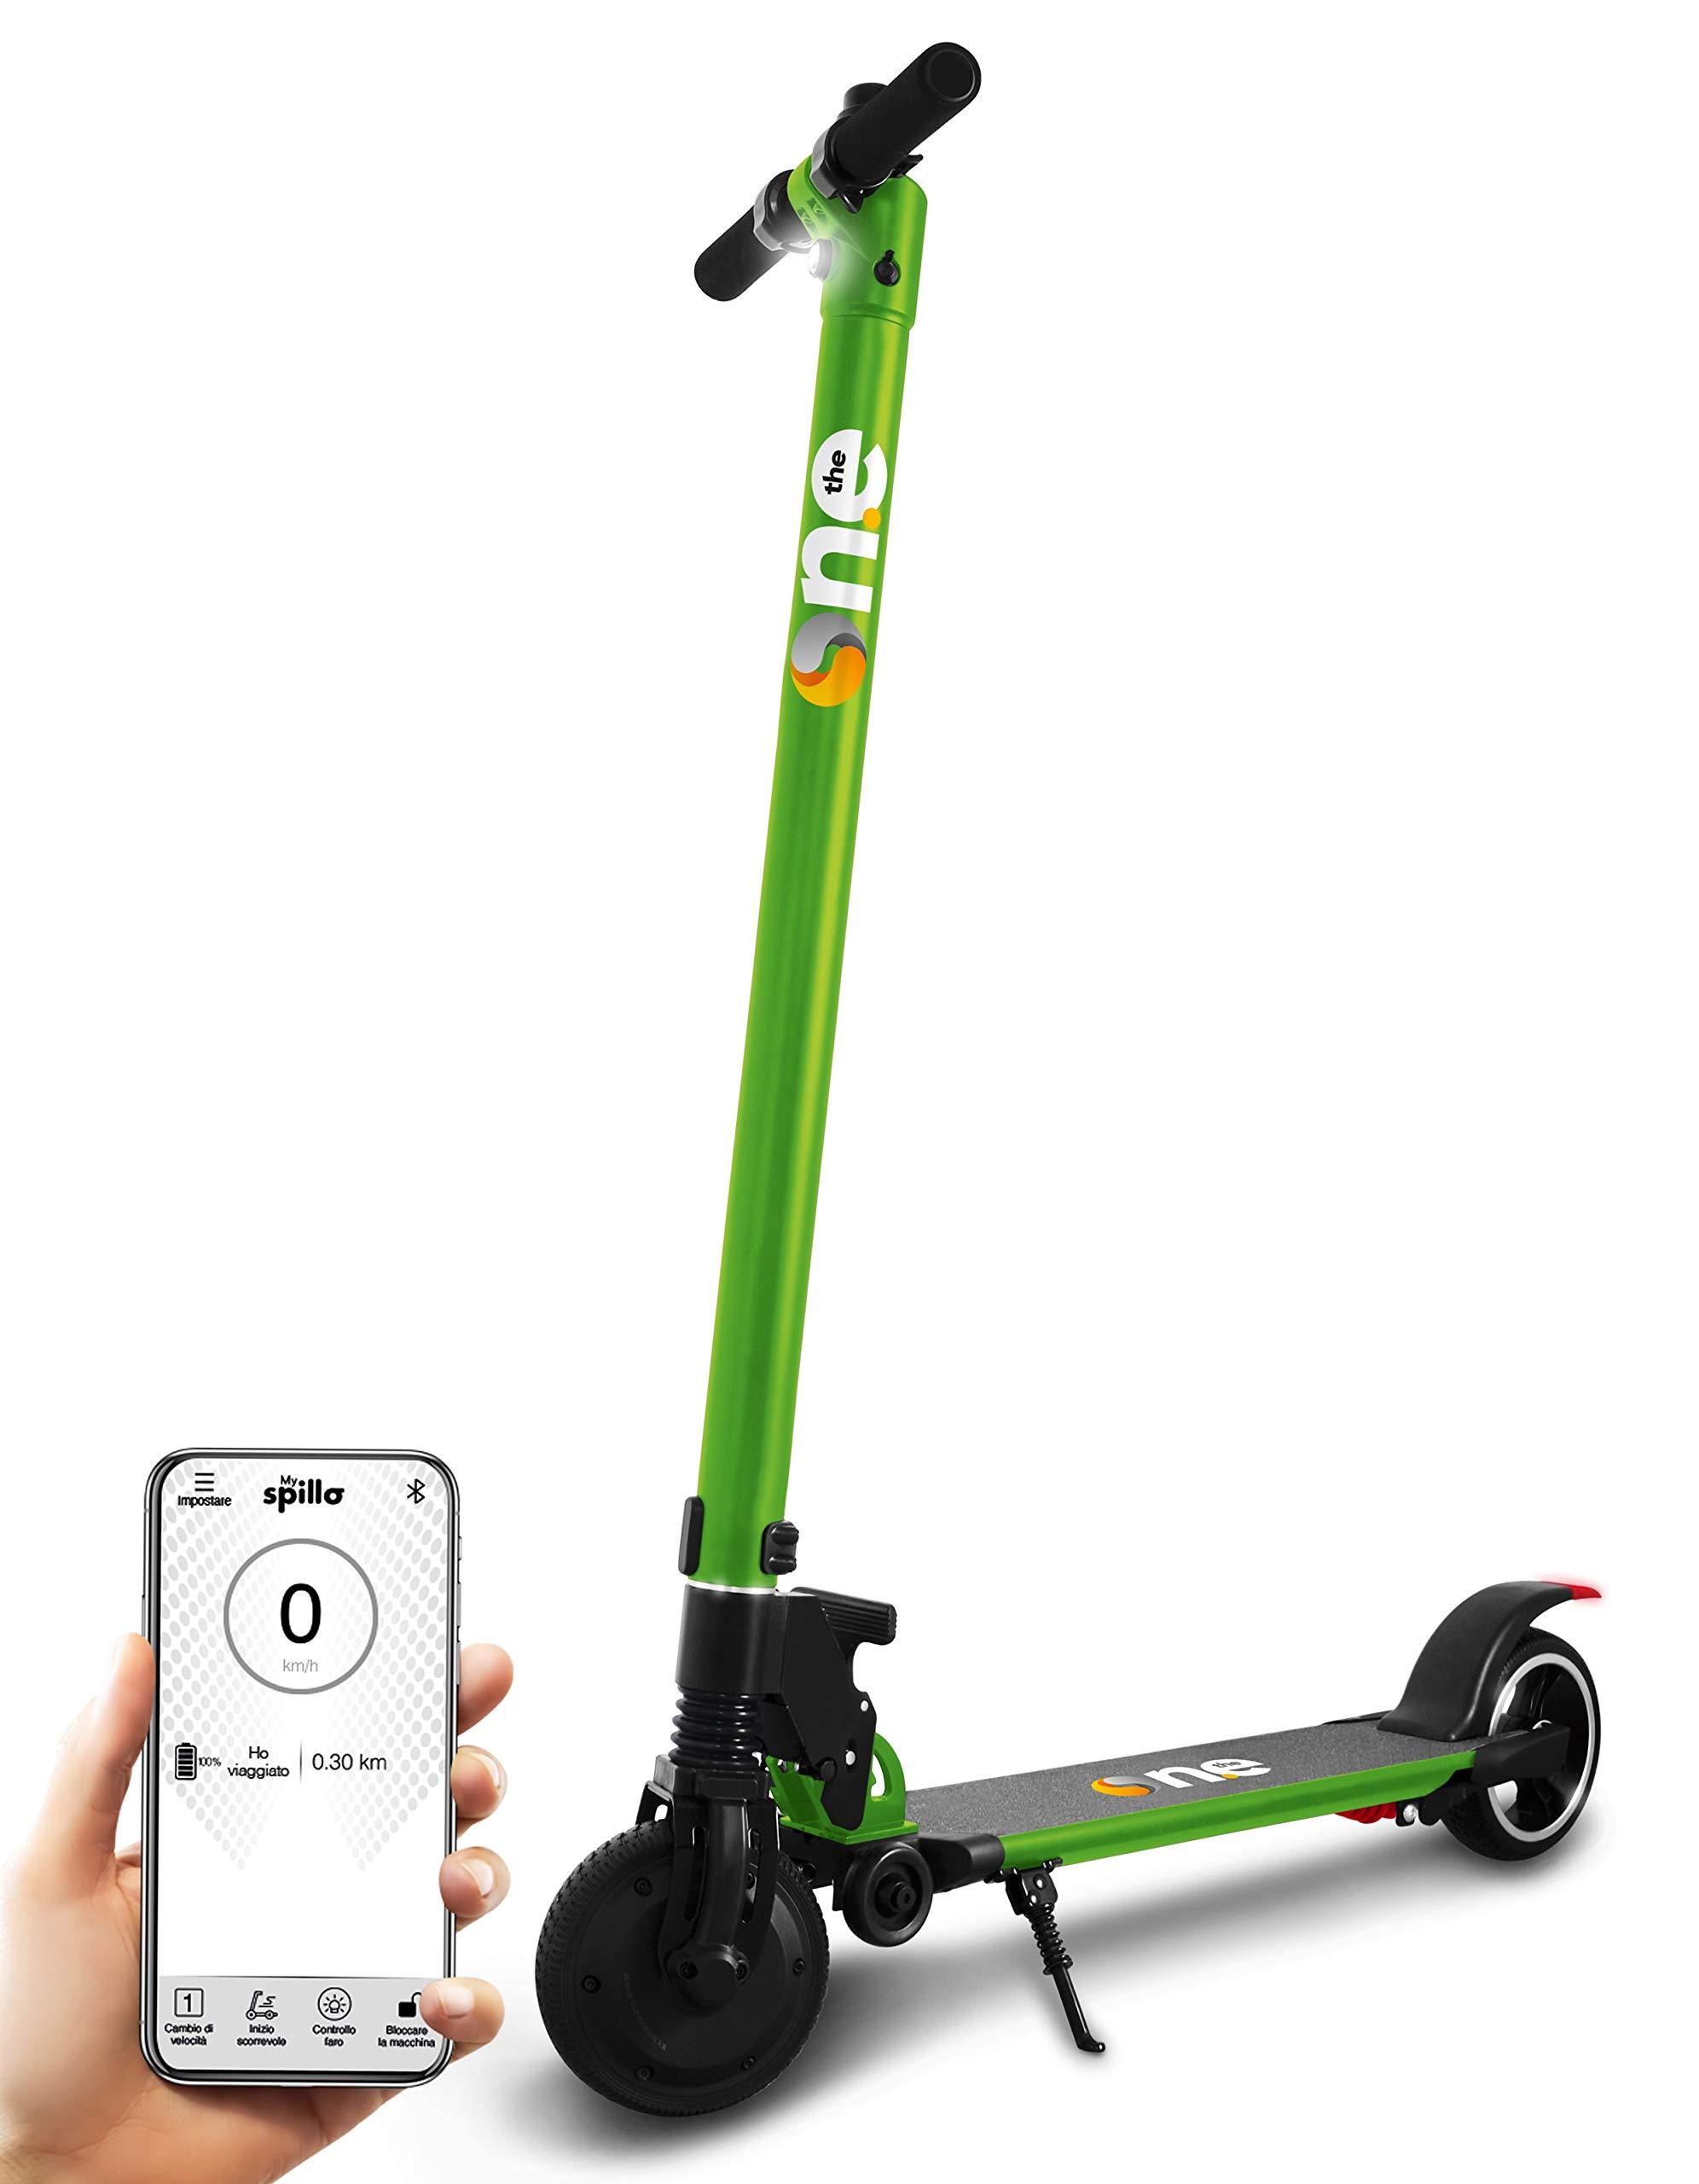 the one Lime Green, Monopattino Elettrico 350W 36V SpilloPRO Adulto Unisex, No Size